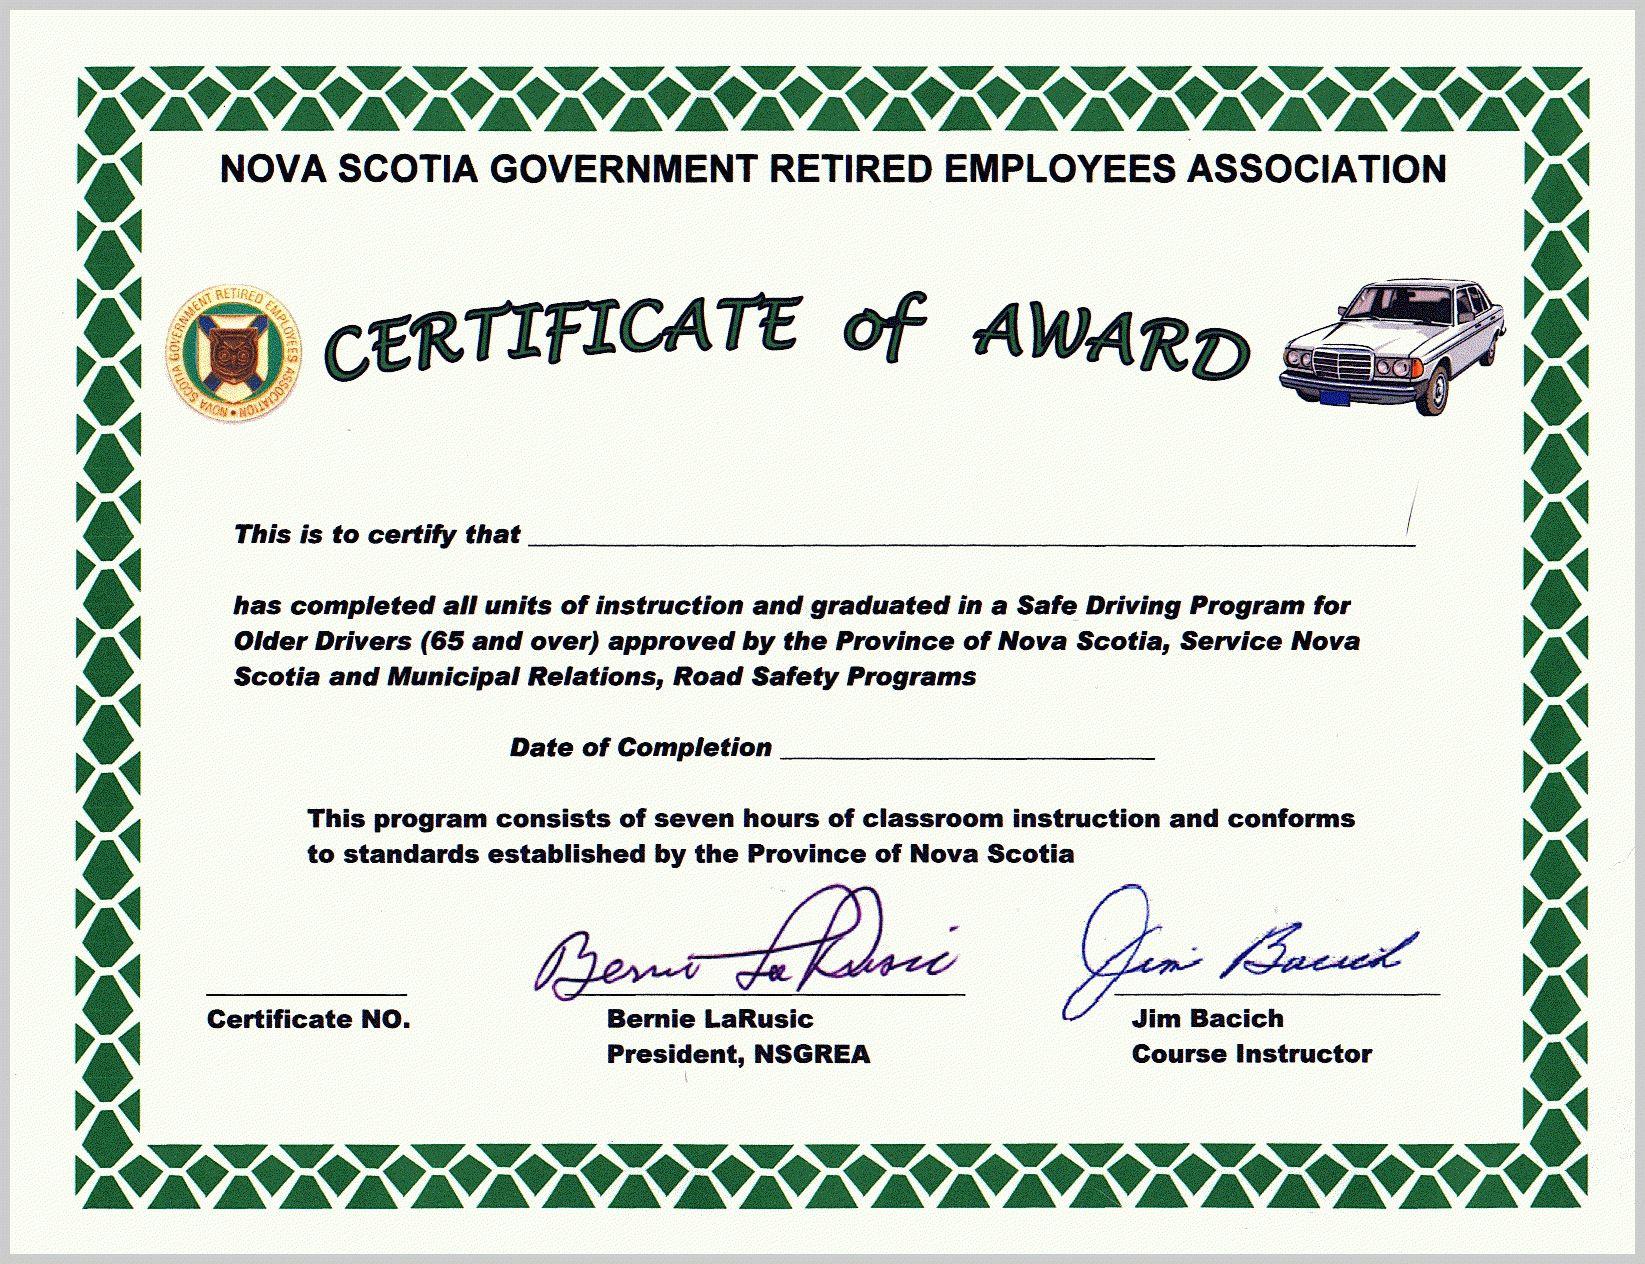 Honorary Membership Certificate Template Word In Safe Driving Certificate Template 10 Certificate Templates Business Plan Template Certificate Of Completion